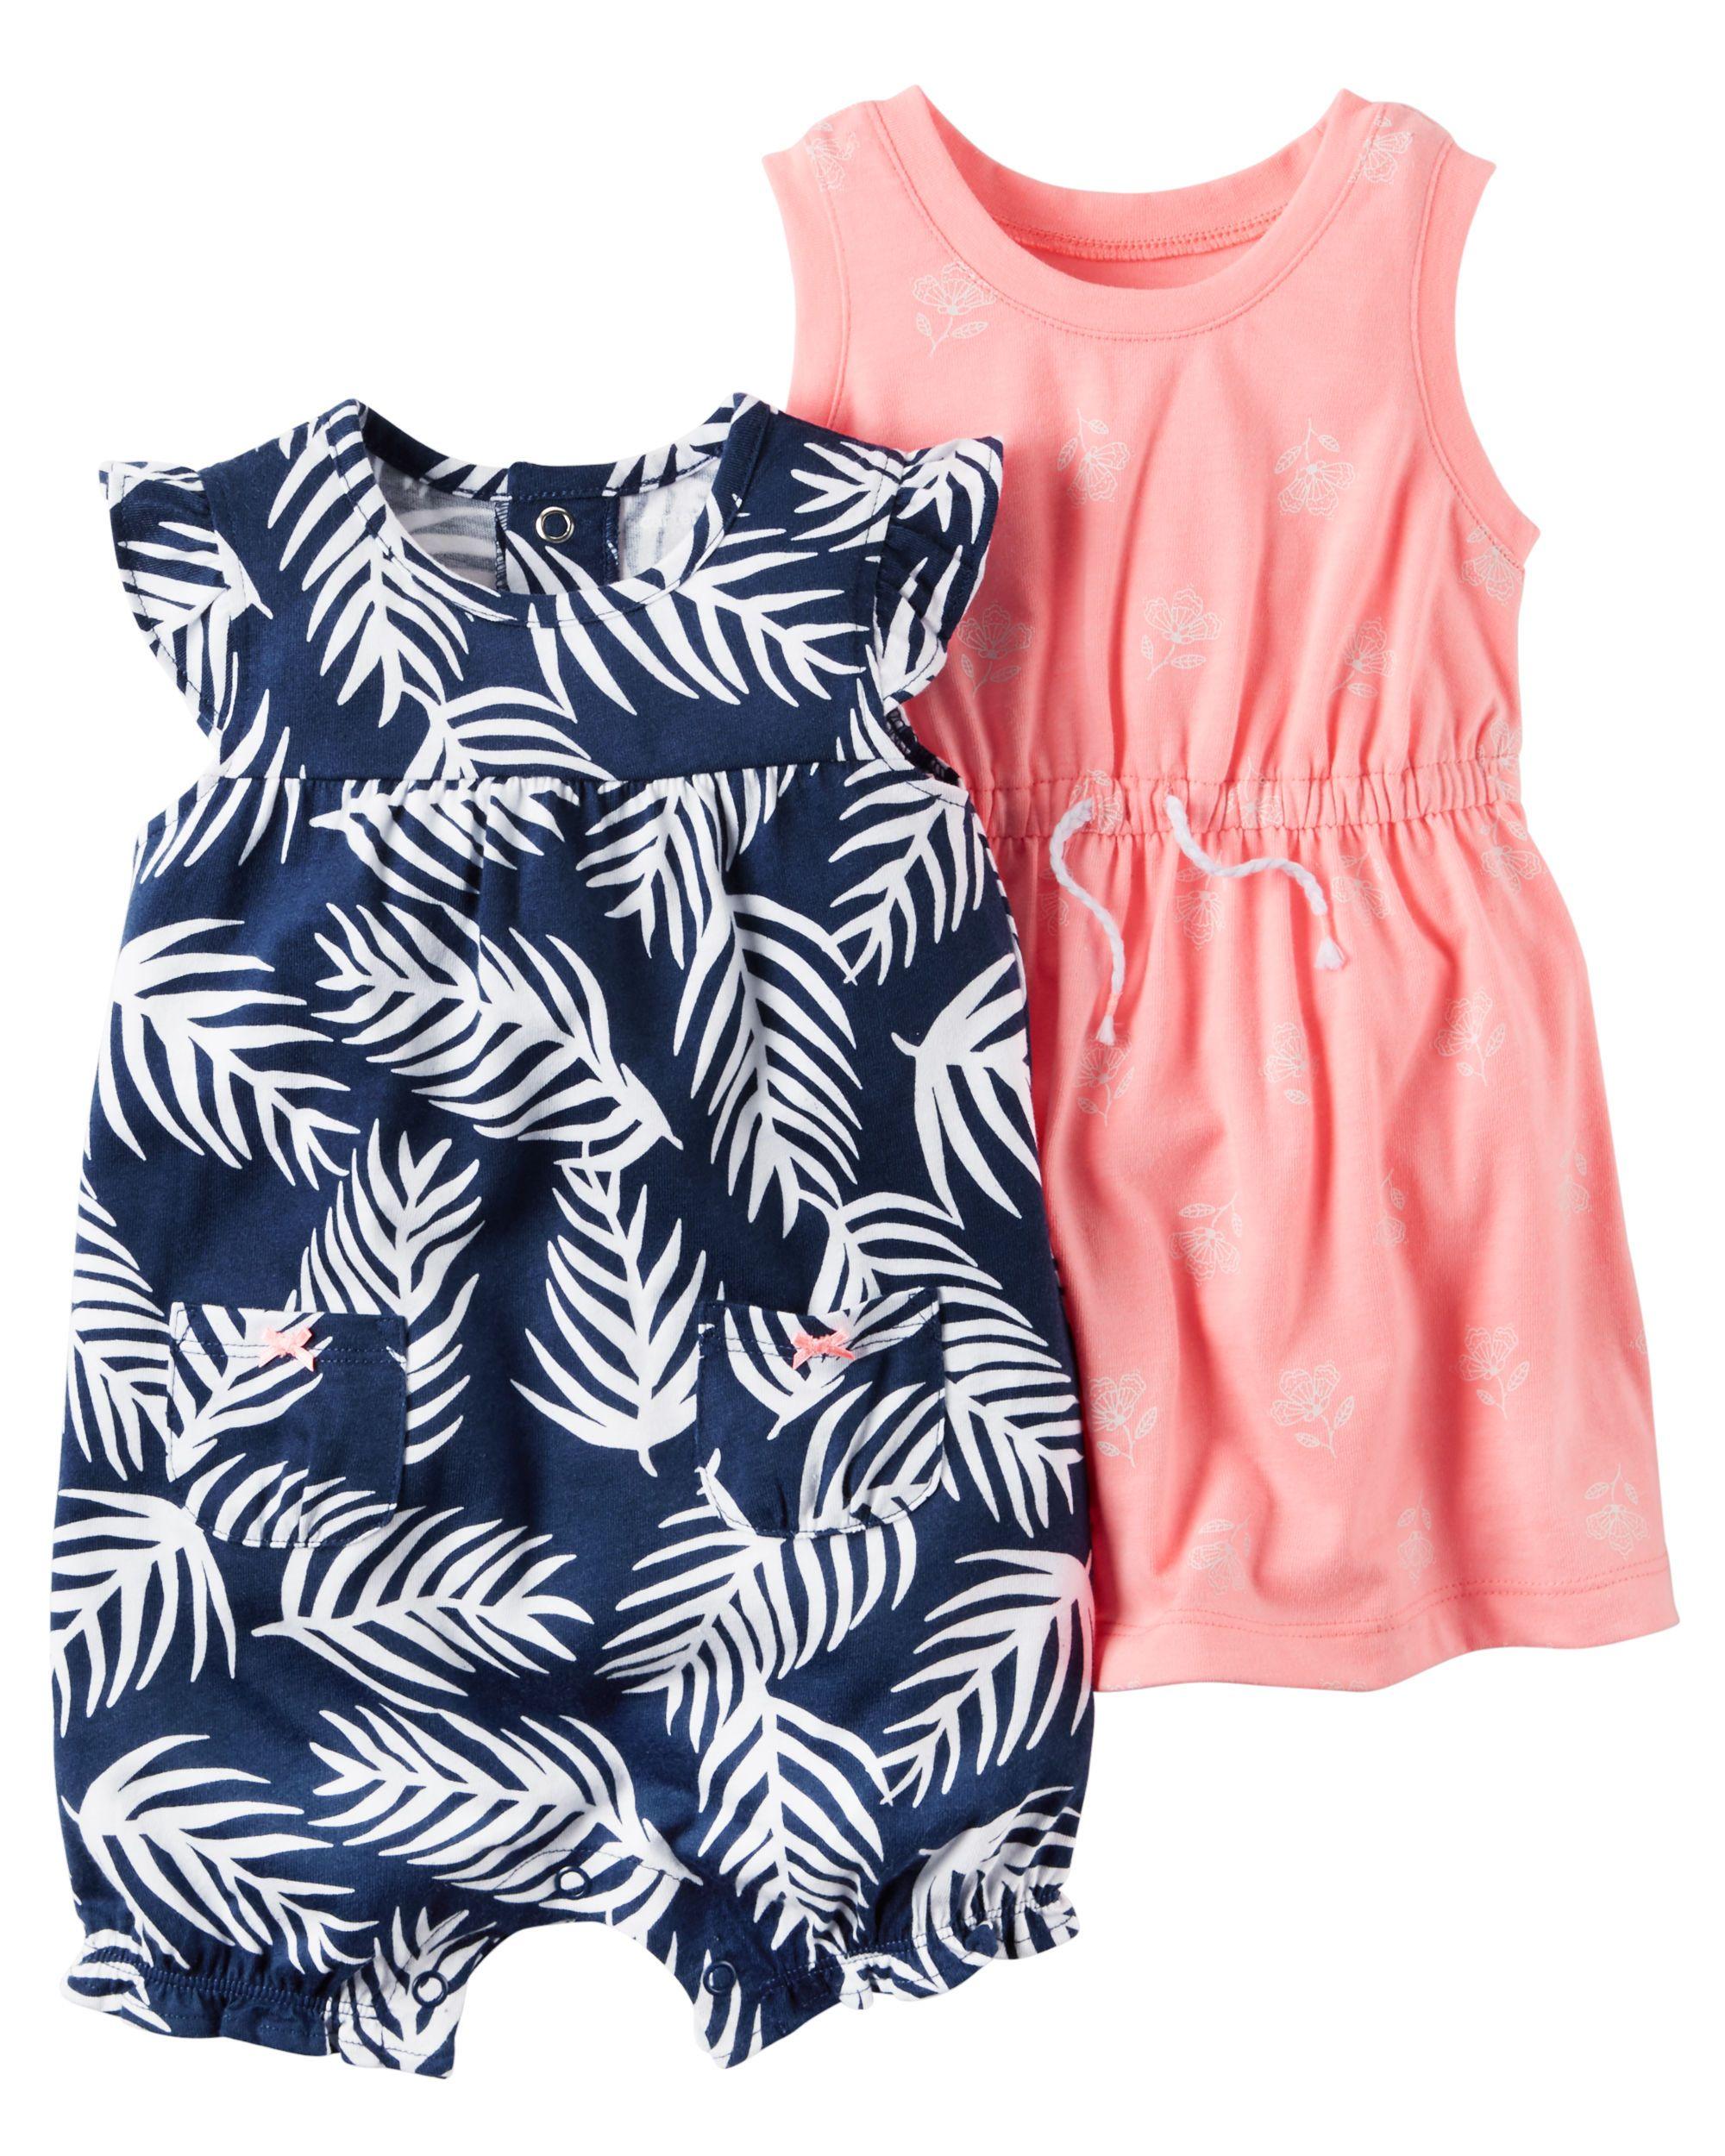 Shop 2 Pack Romper Neon Dress Set At Cartersoshkosh Ca Visit